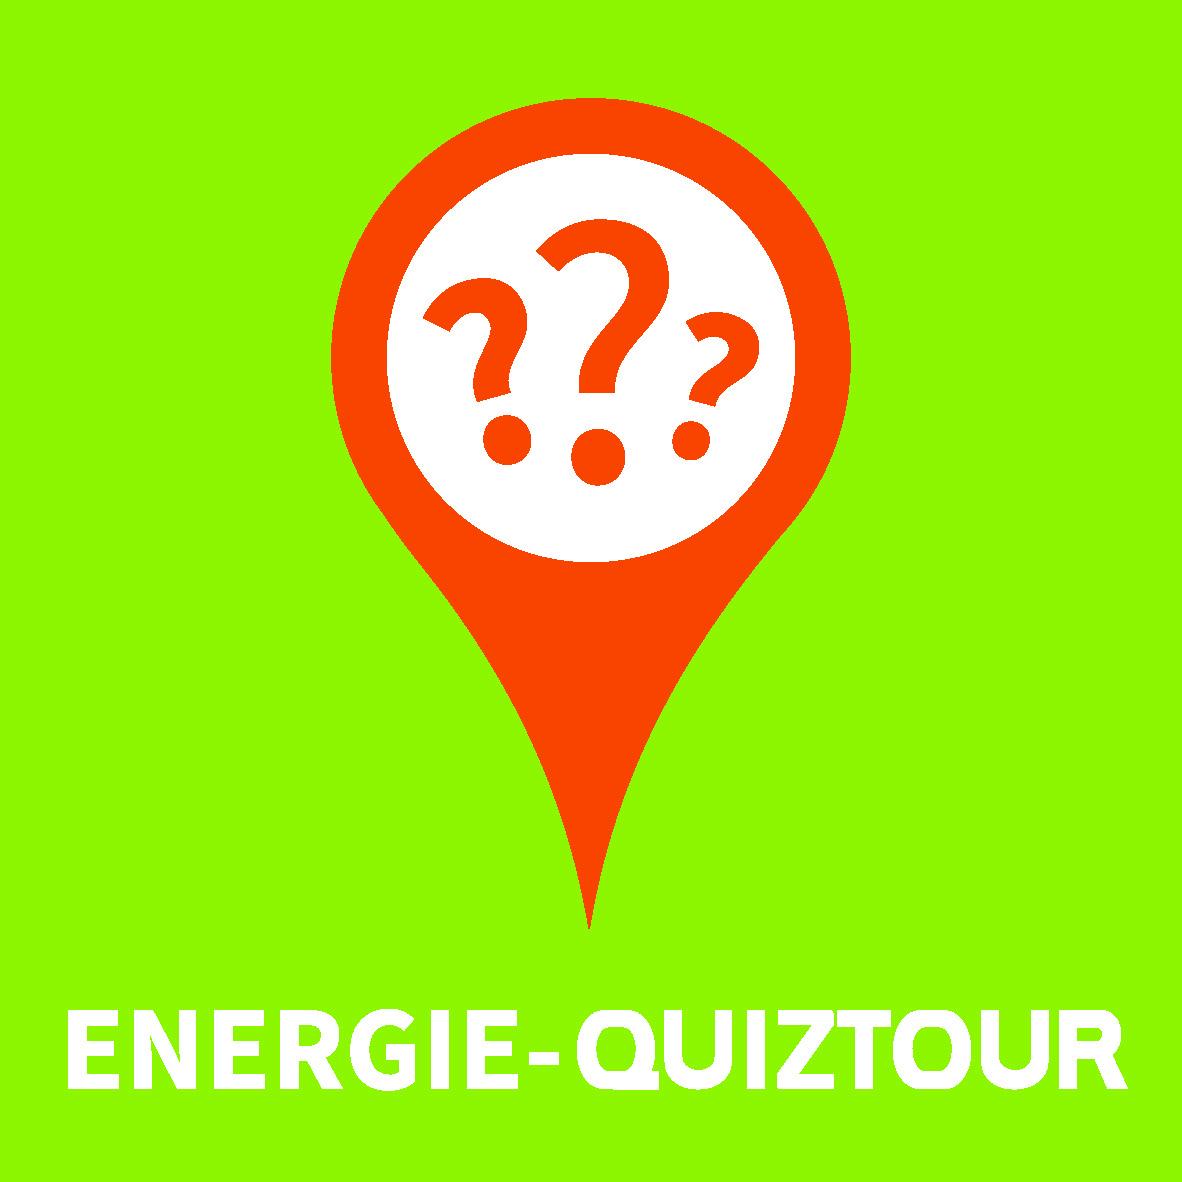 Wegmarkierung Energie-Quiztour